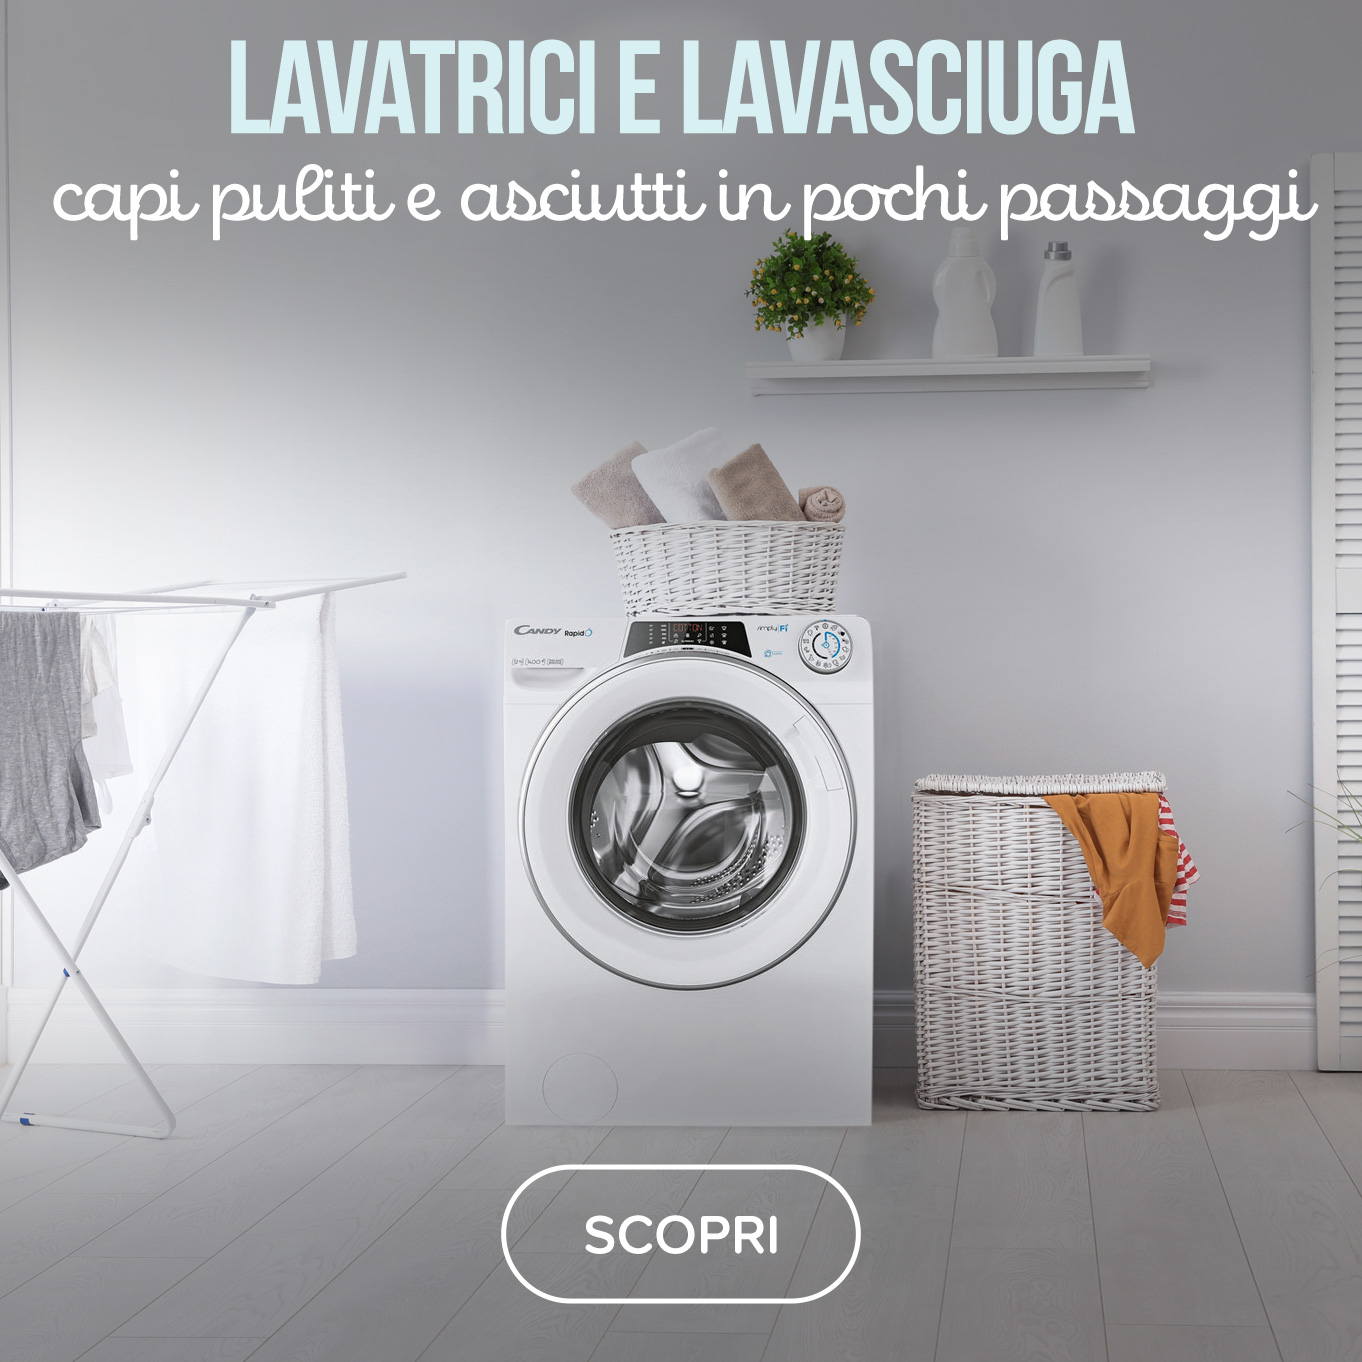 Lavatrici e lavasciuga